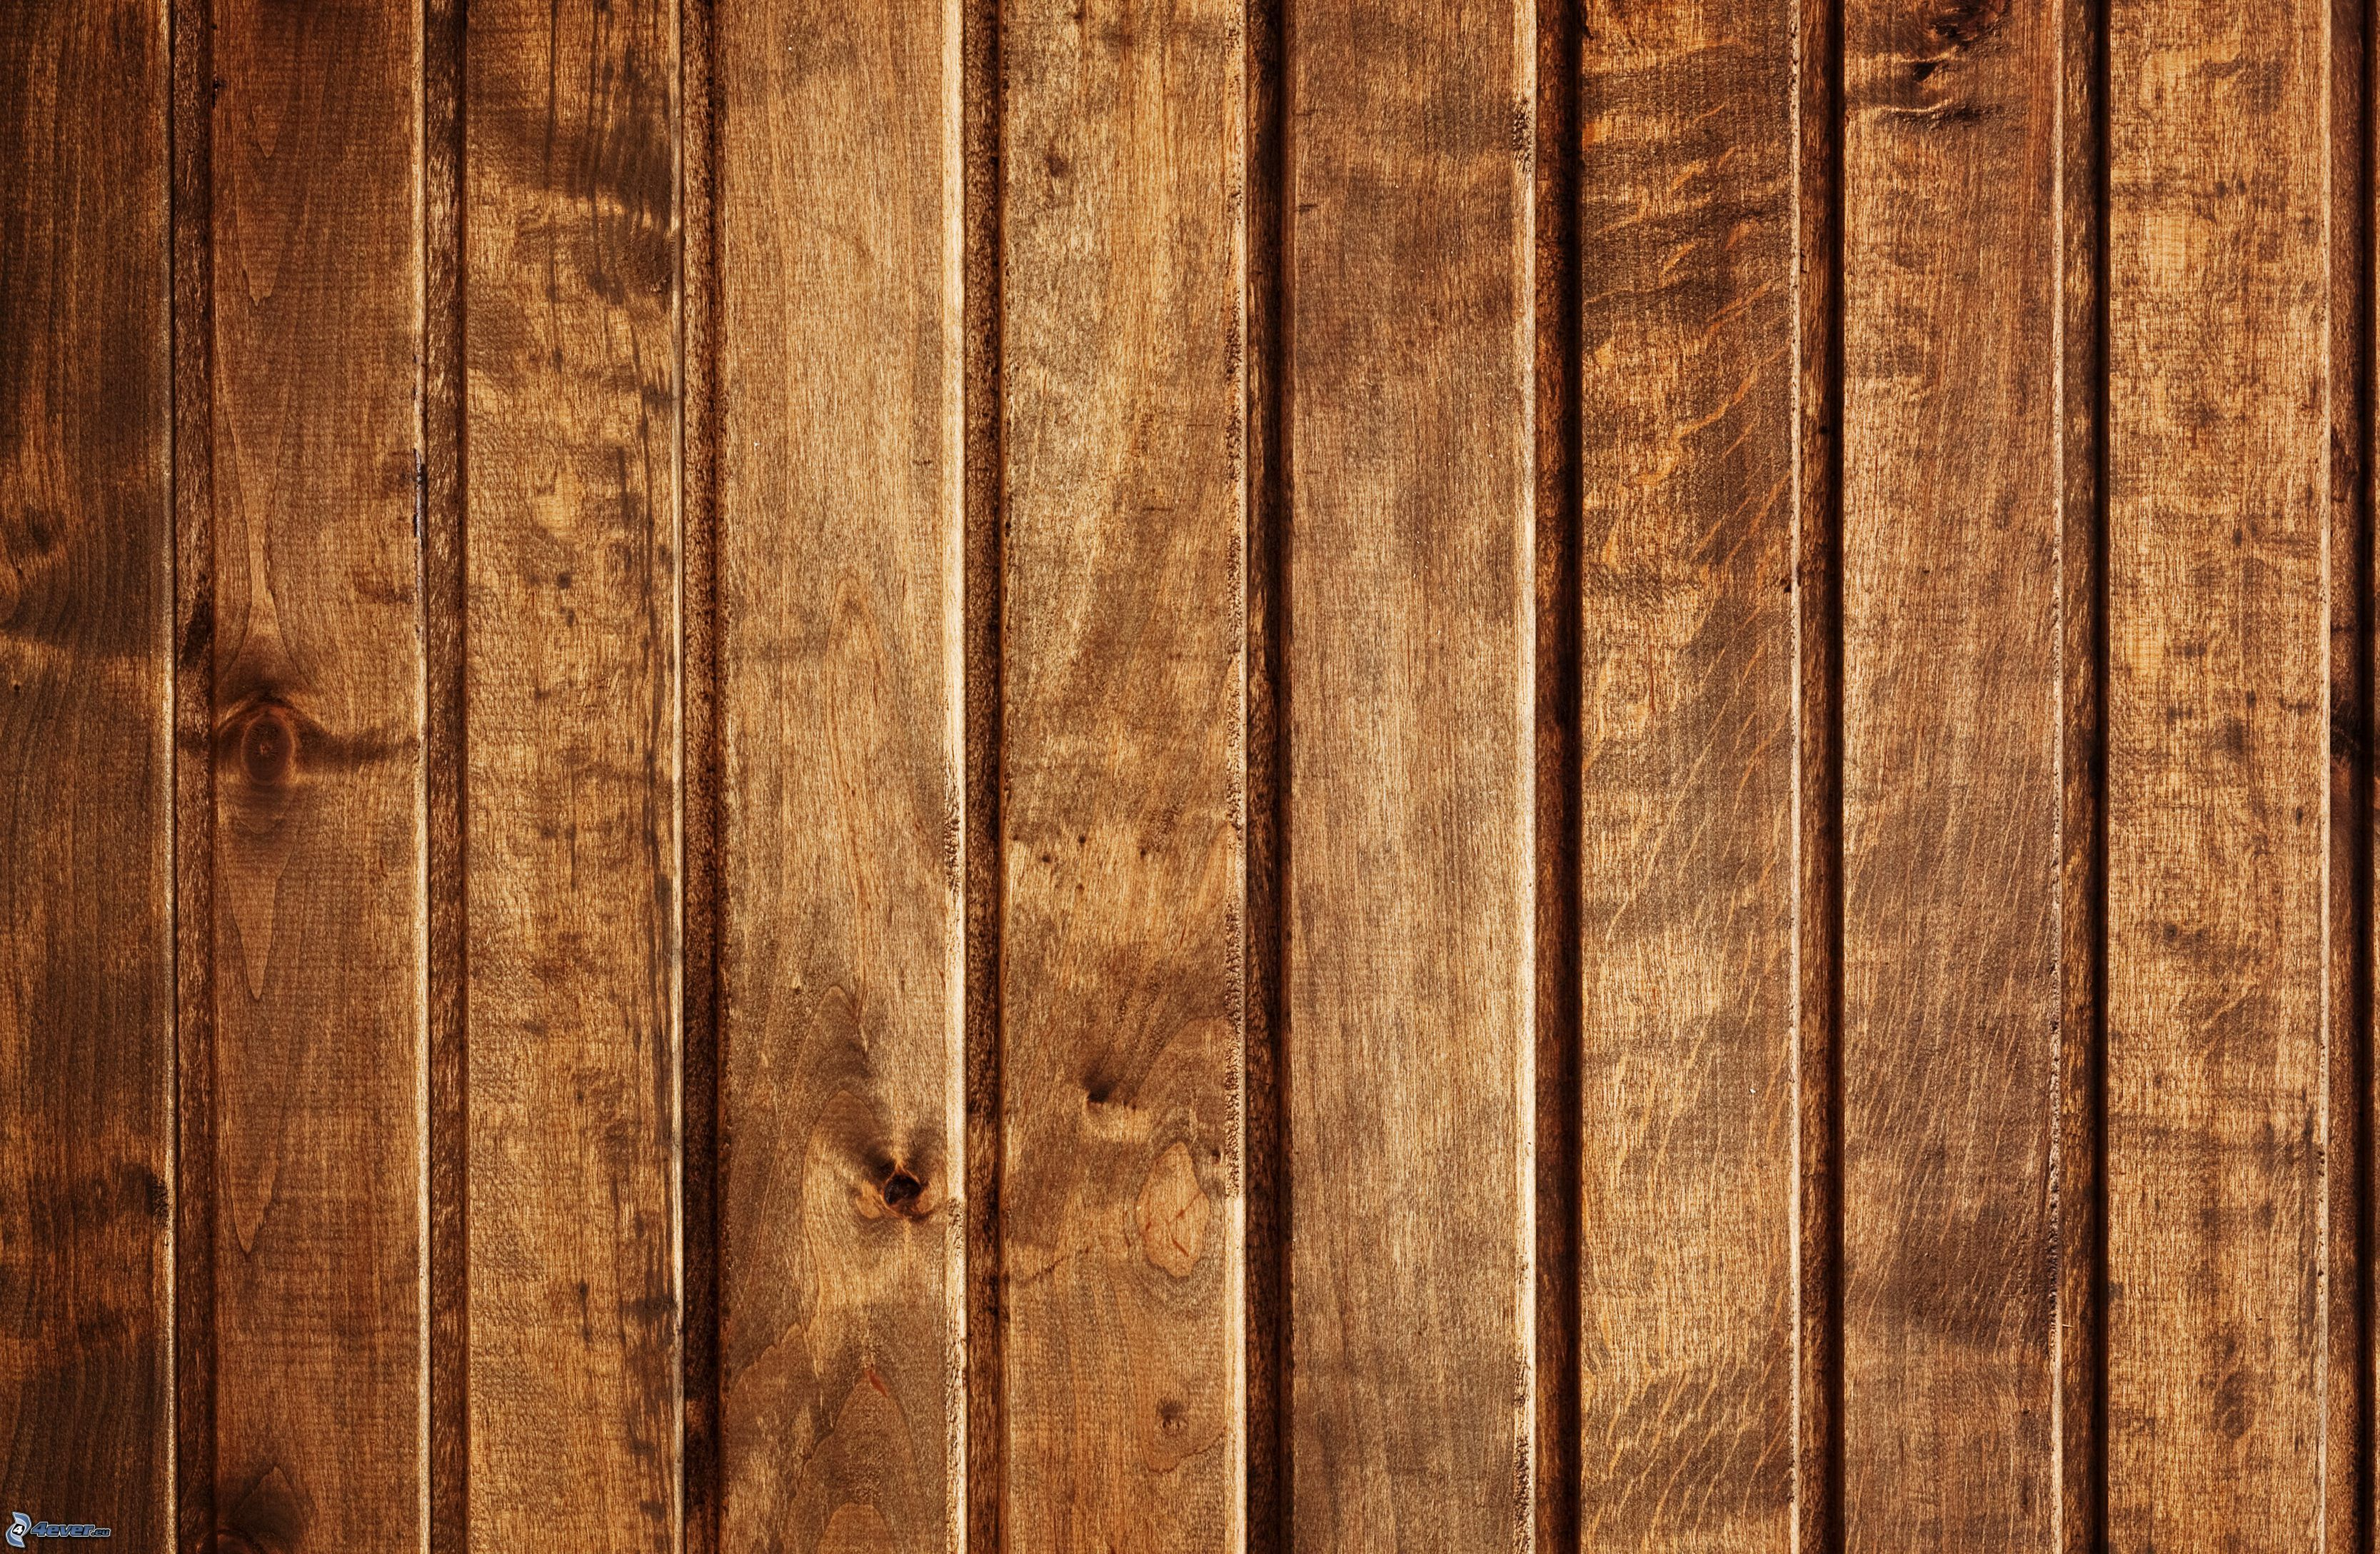 Pared de madera for Paredes en madera